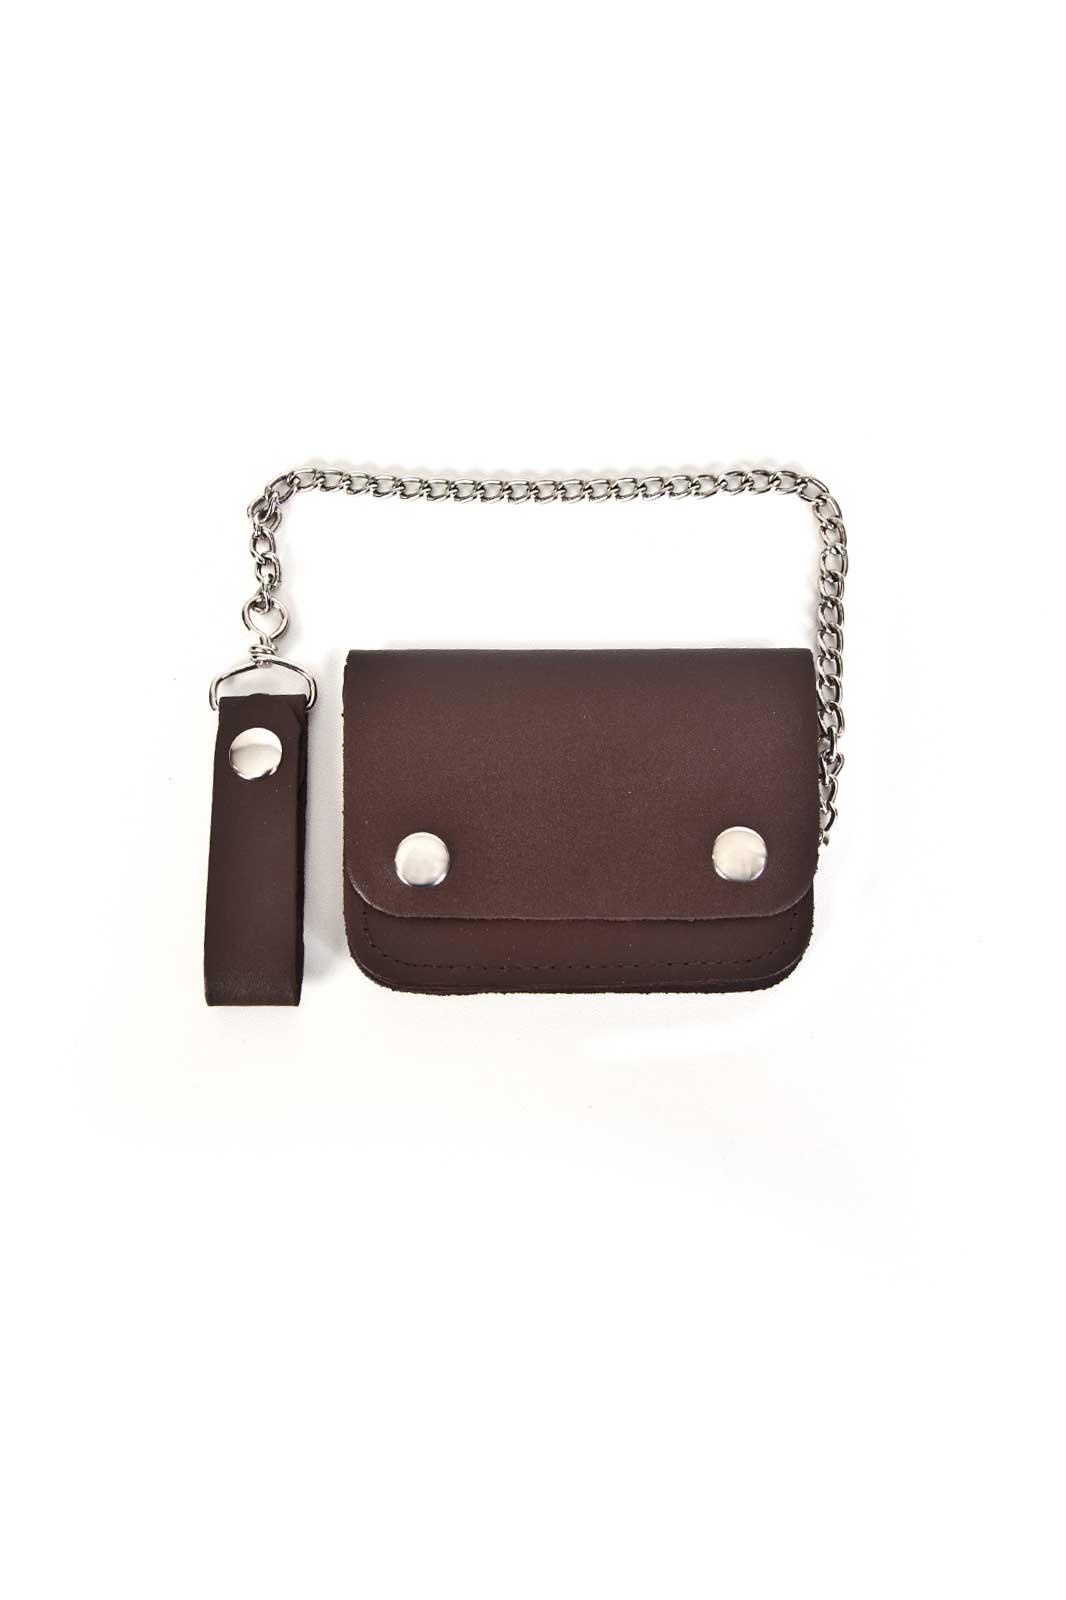 Leather Biker Wallet Small Bi-Fold Brown